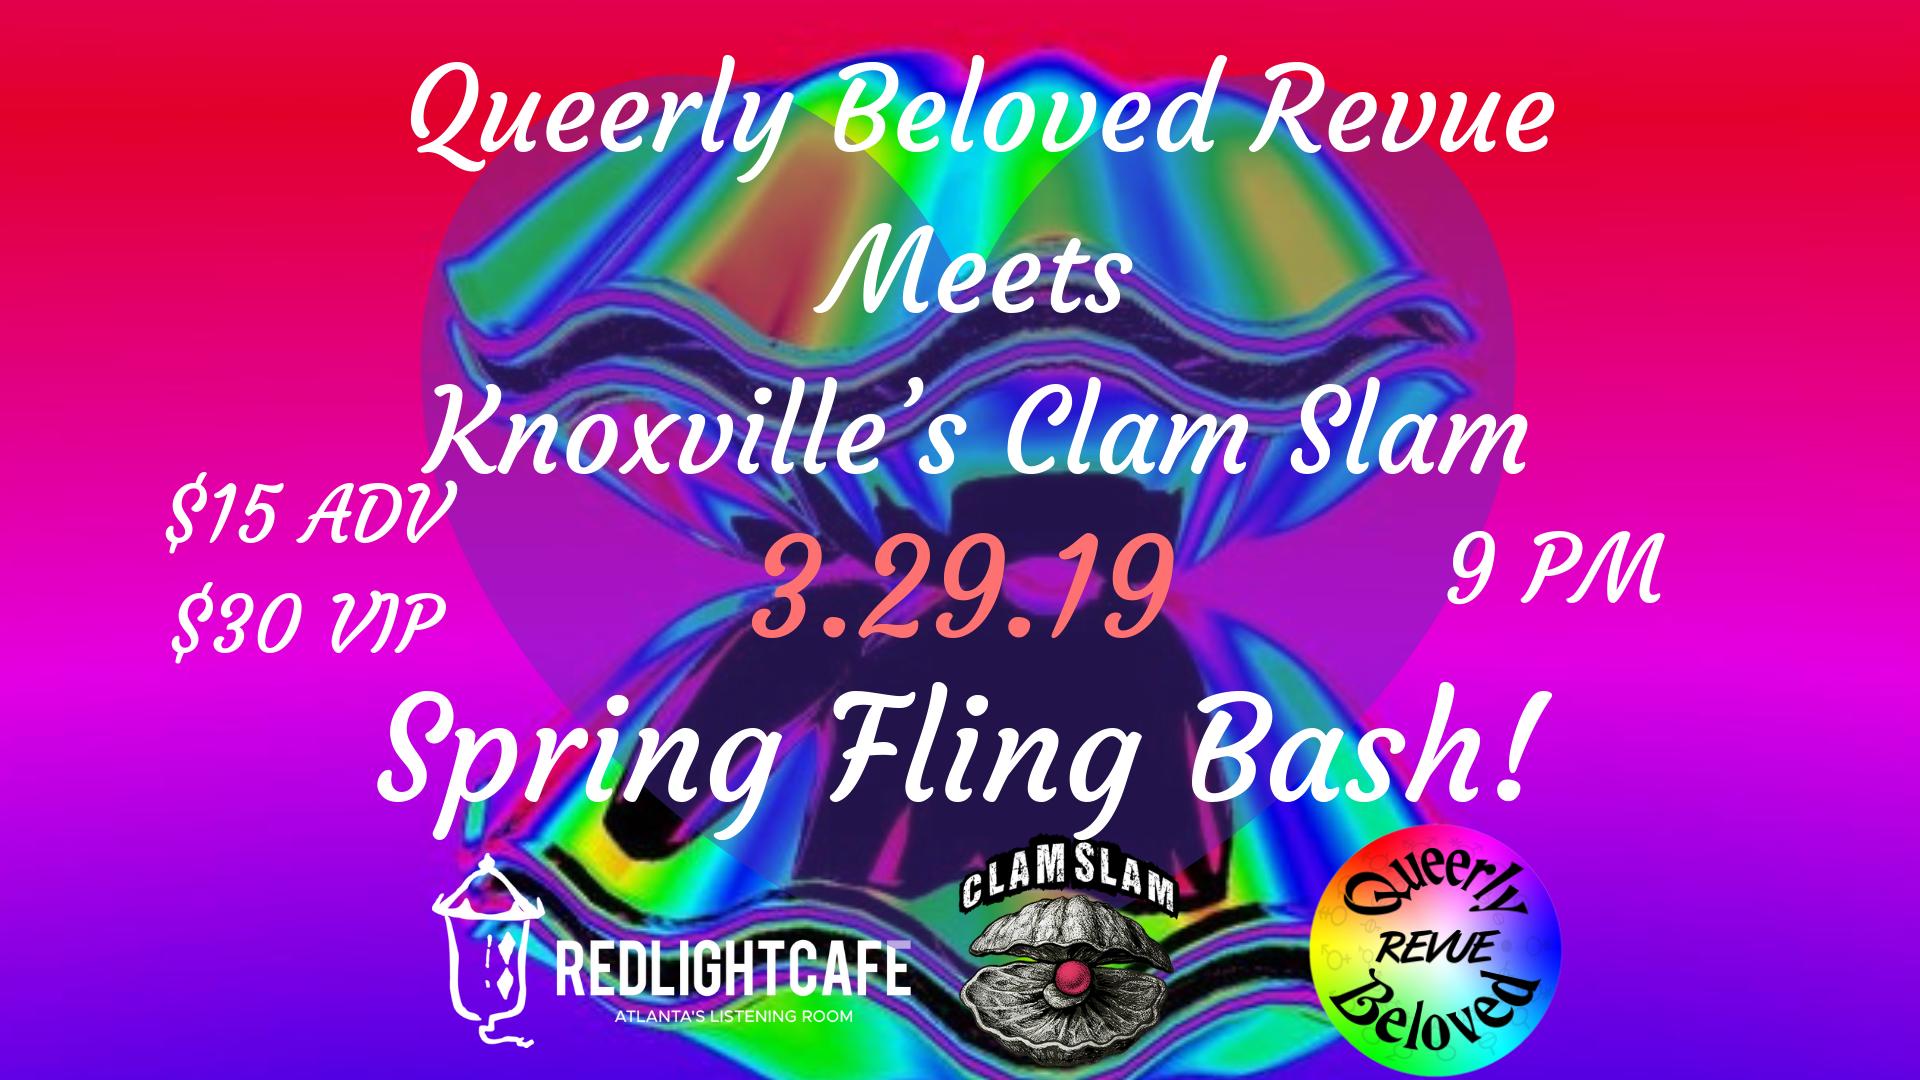 Queerly Beloved meets Clam Slam: A Spring Fling — March 29, 2019 — Red Light Café, Atlanta, GA